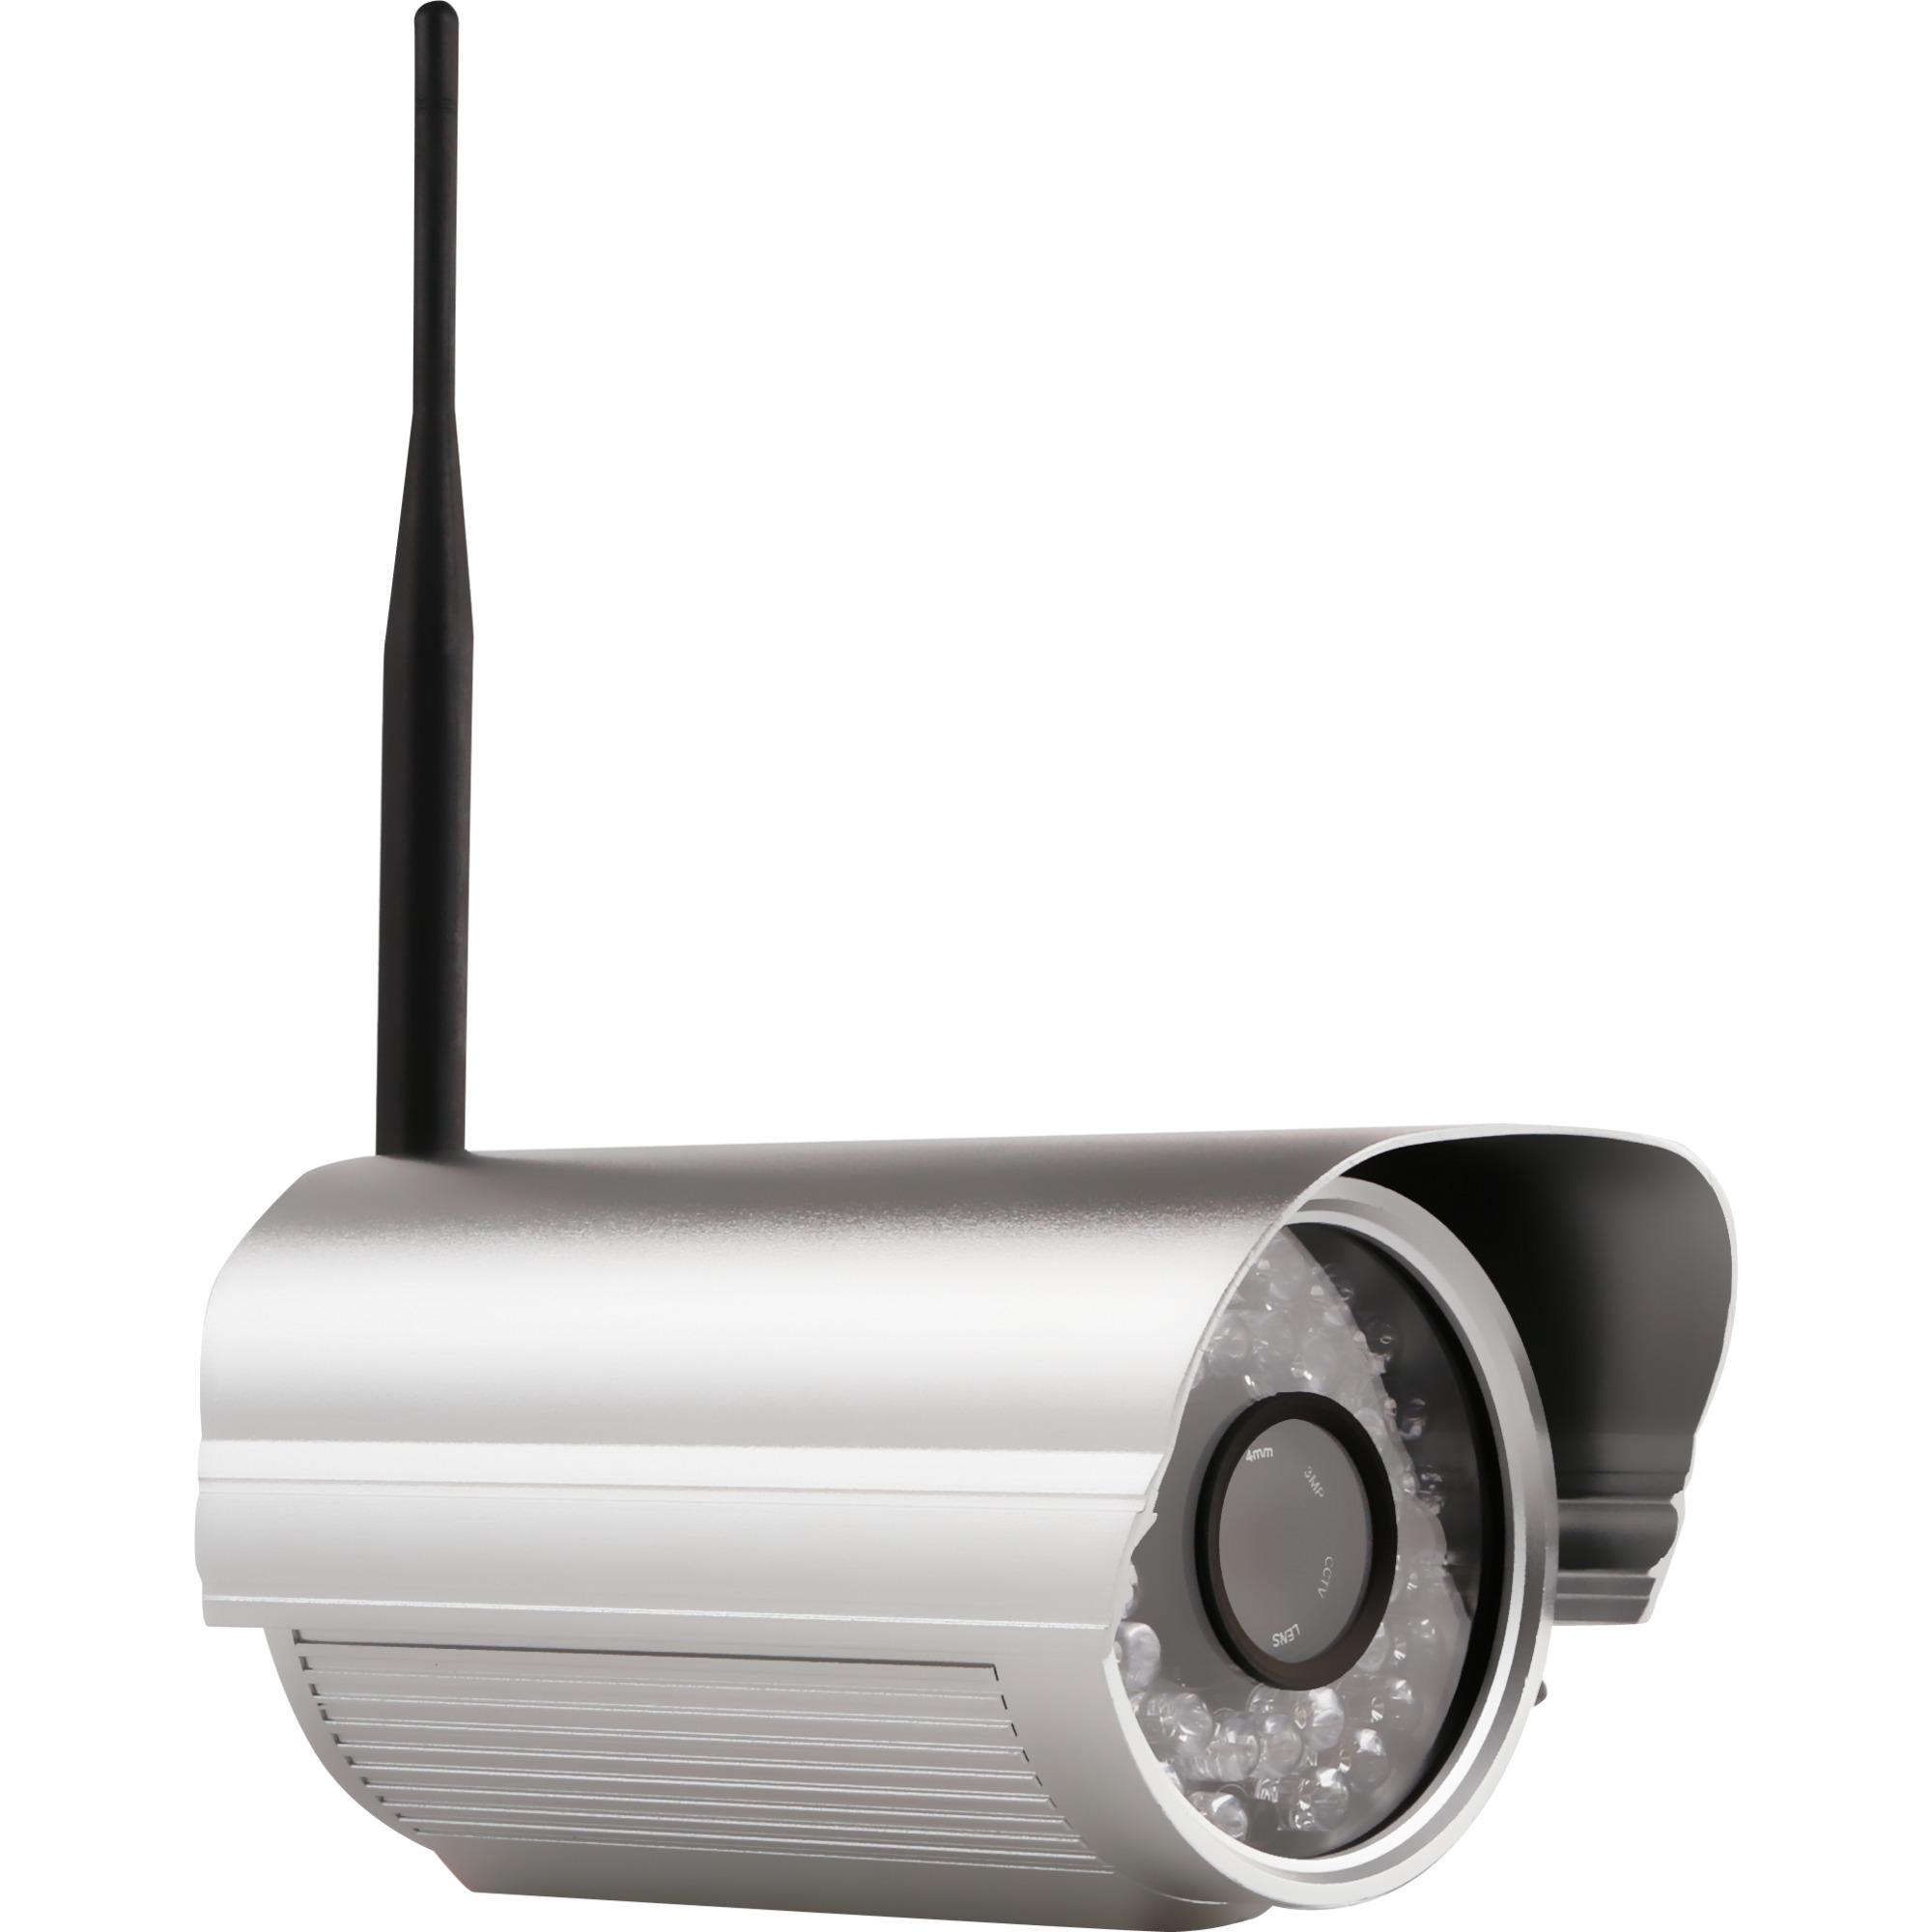 FI9805W IP security camera Exterior Bala Plata cámara de vigilancia, Cámara de red